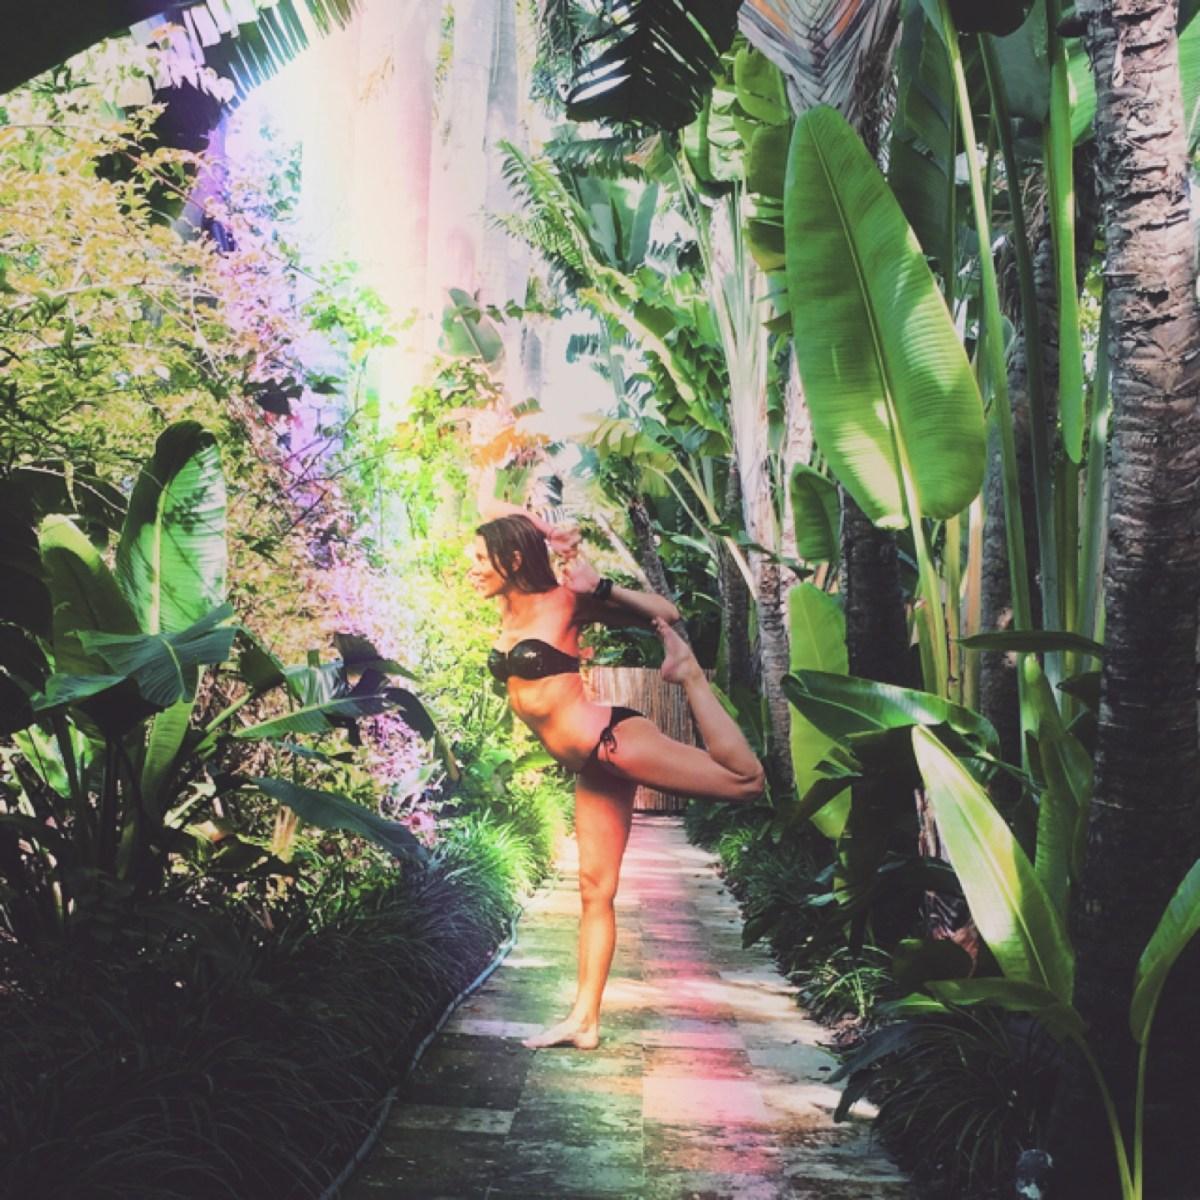 Best-Rainbow-Photo-Filters-And-Rainbow-Photo-Editor-App-4